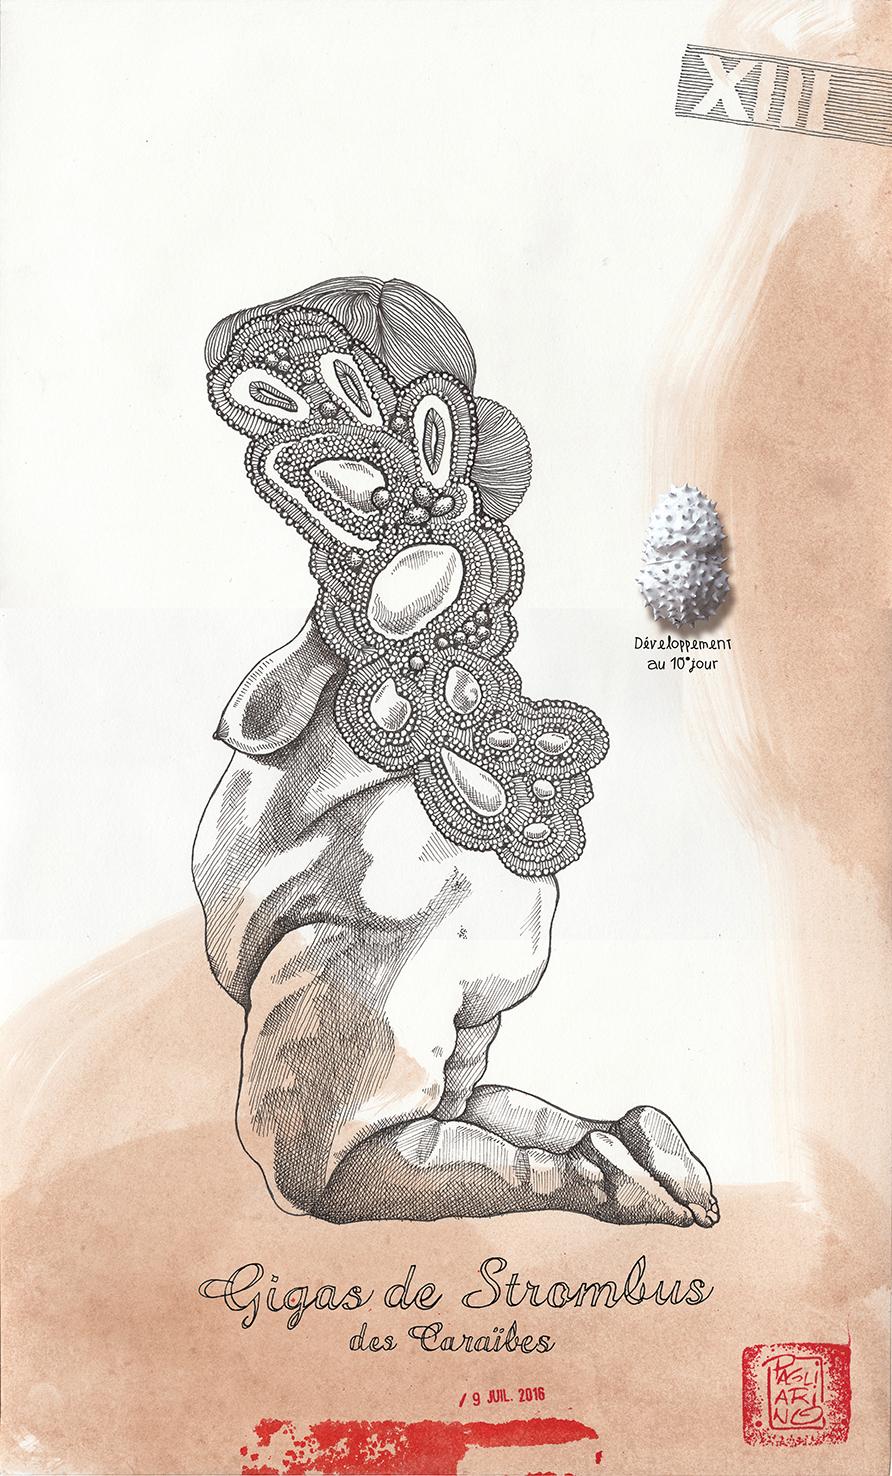 Specimen 13, MER DES CARAIBES, by elia pagliarino